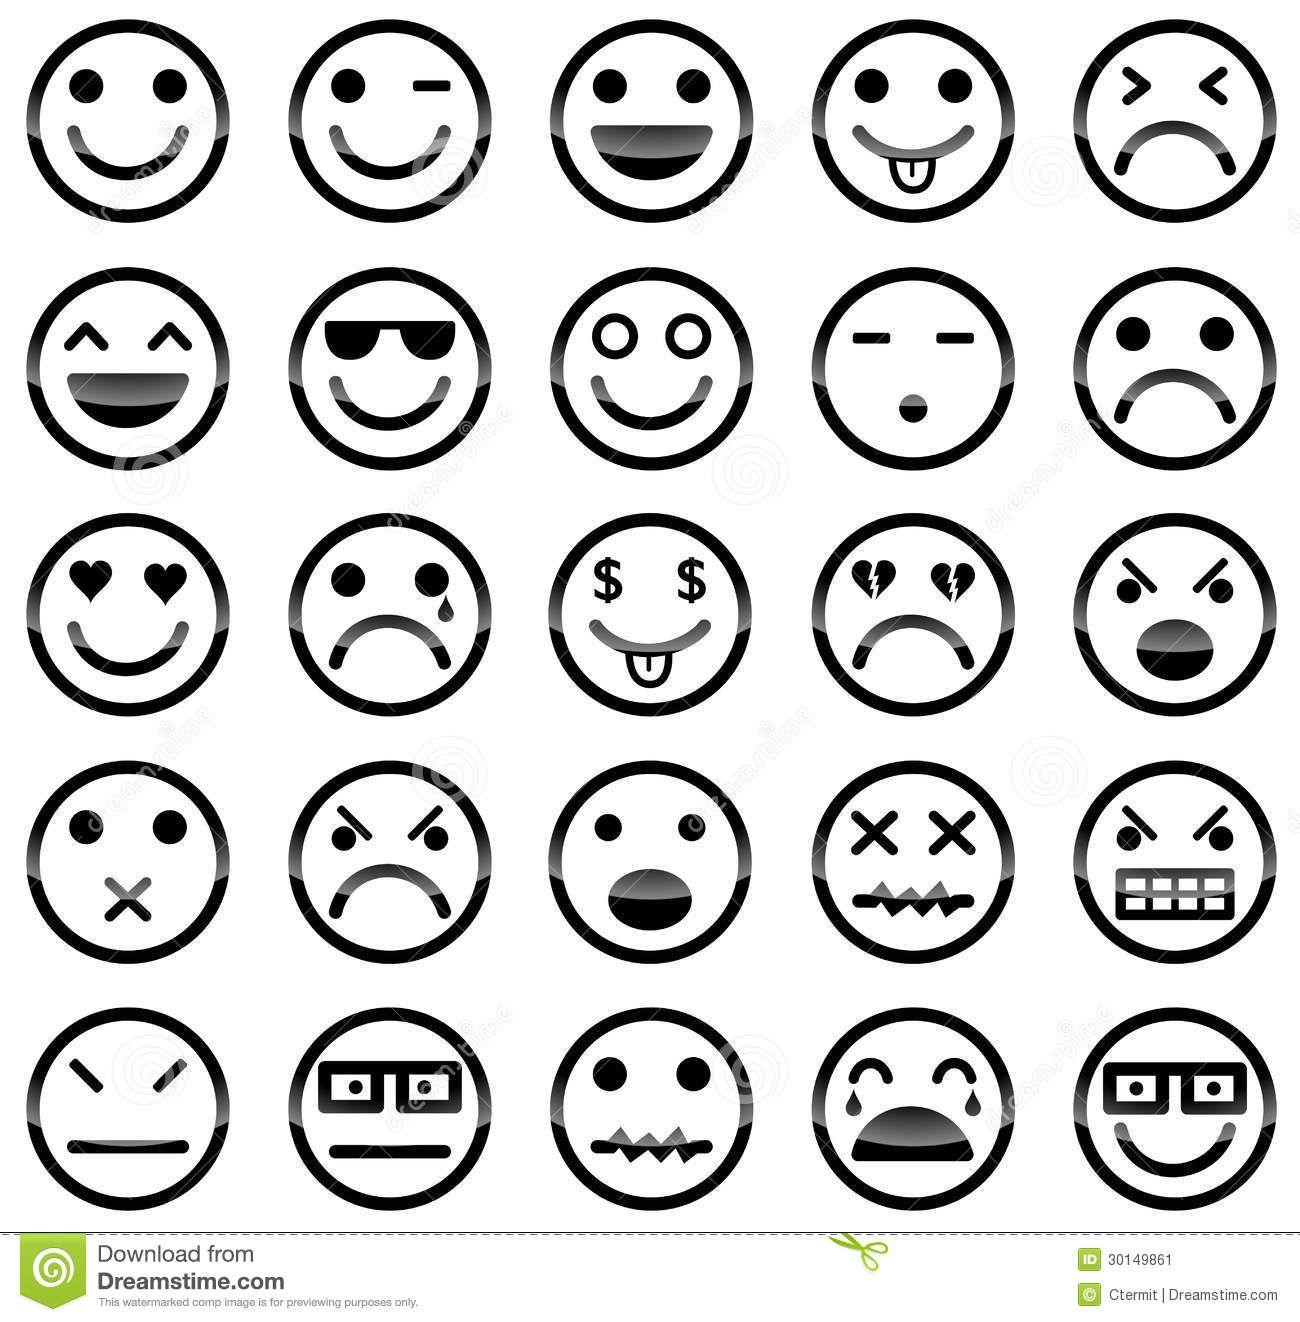 Black And White Emojis To Color Google Search Emoji Coloring Pages Emoji Faces Emoji Drawings